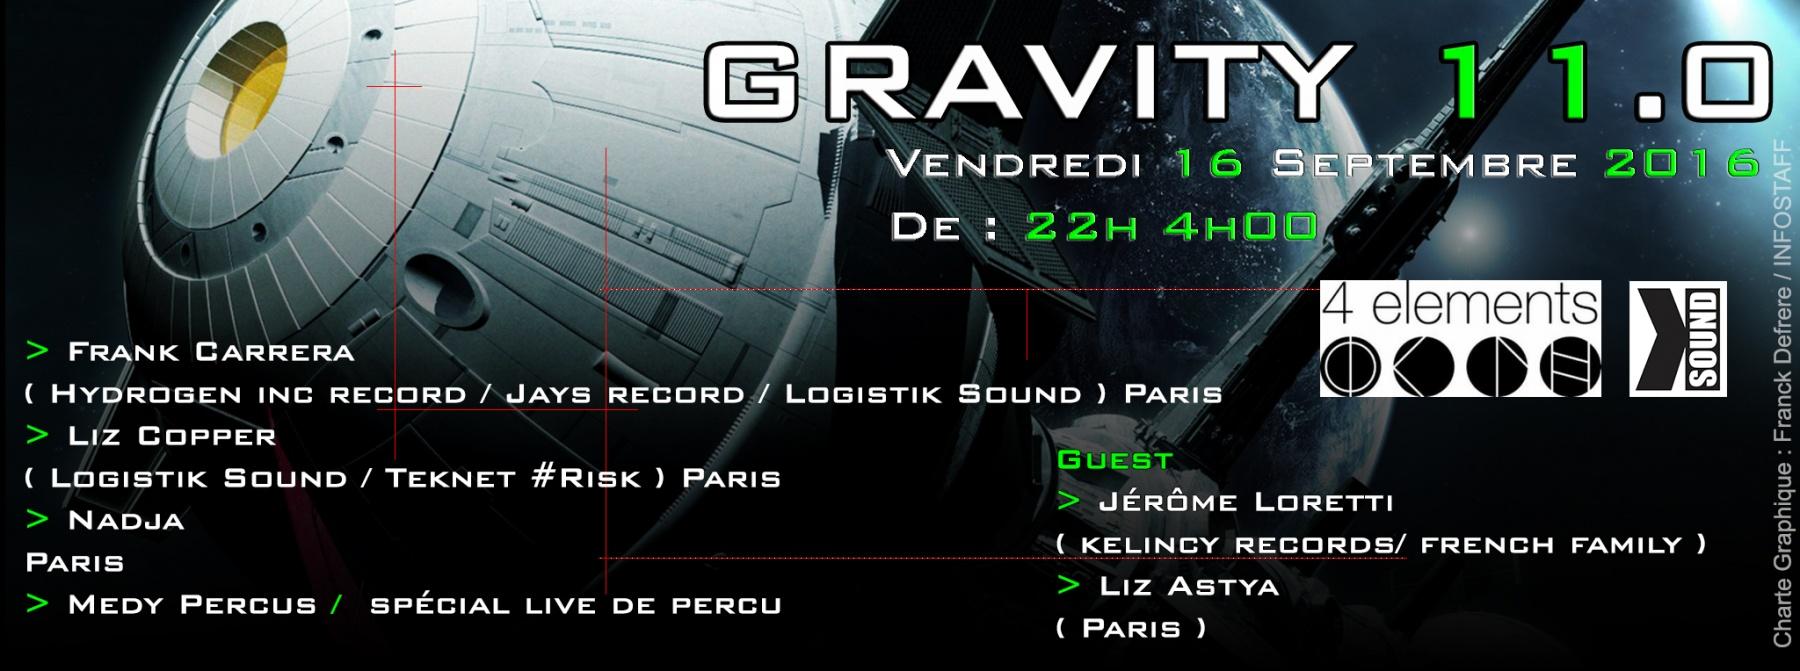 gravity-11